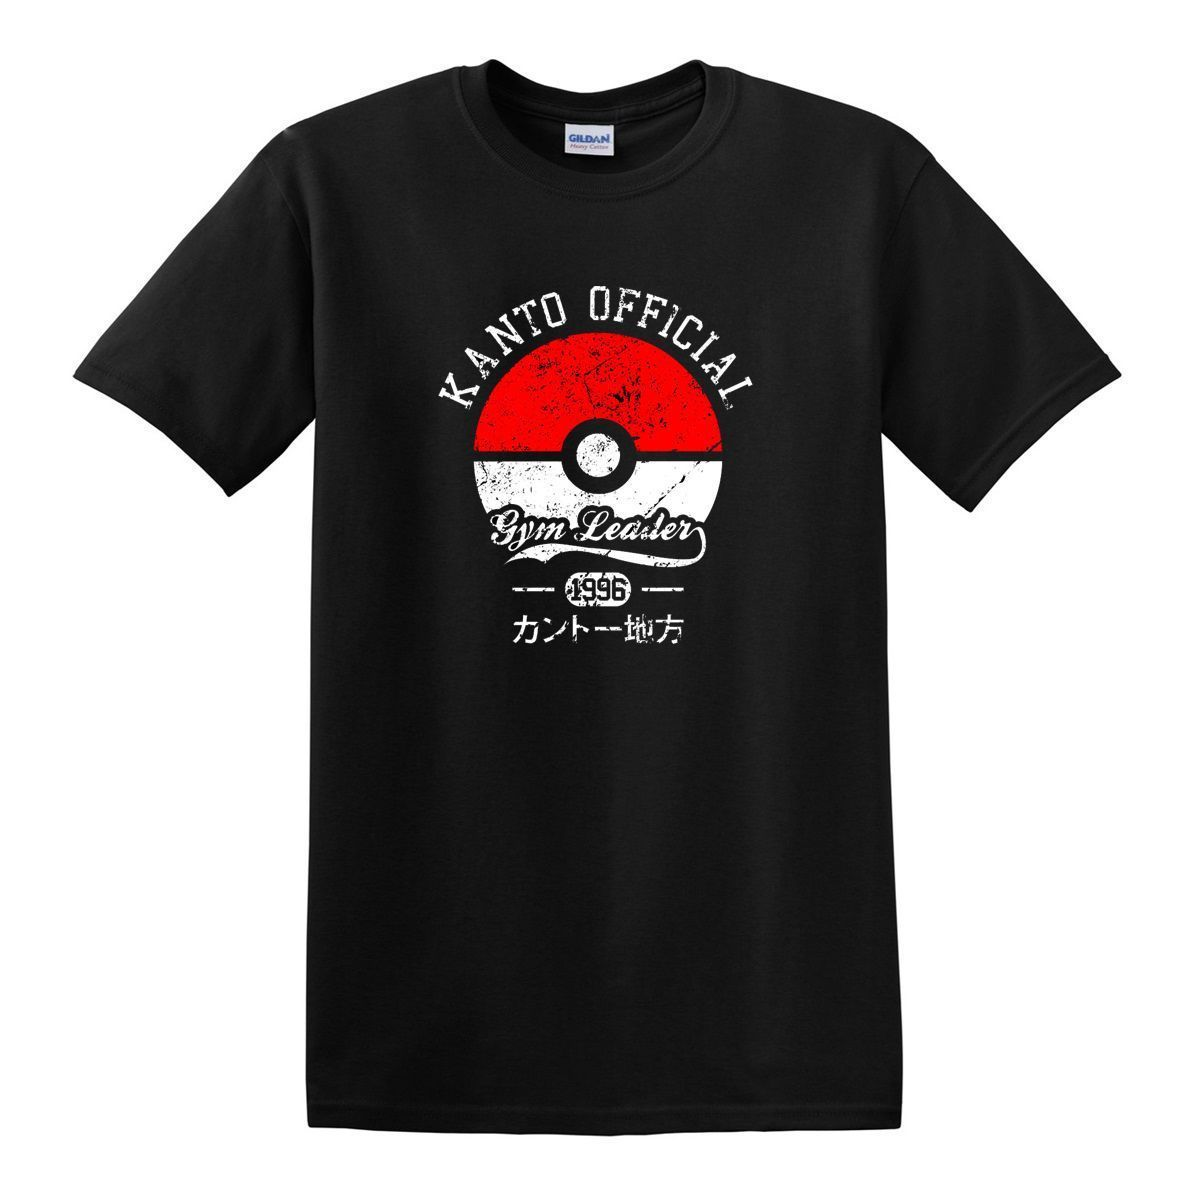 Kanto Gymer Leader Pokemon Go Trainer Game T-shirt New Fashion Mens Short Sleeve T Shirt Cotton Hot Cheap MenS